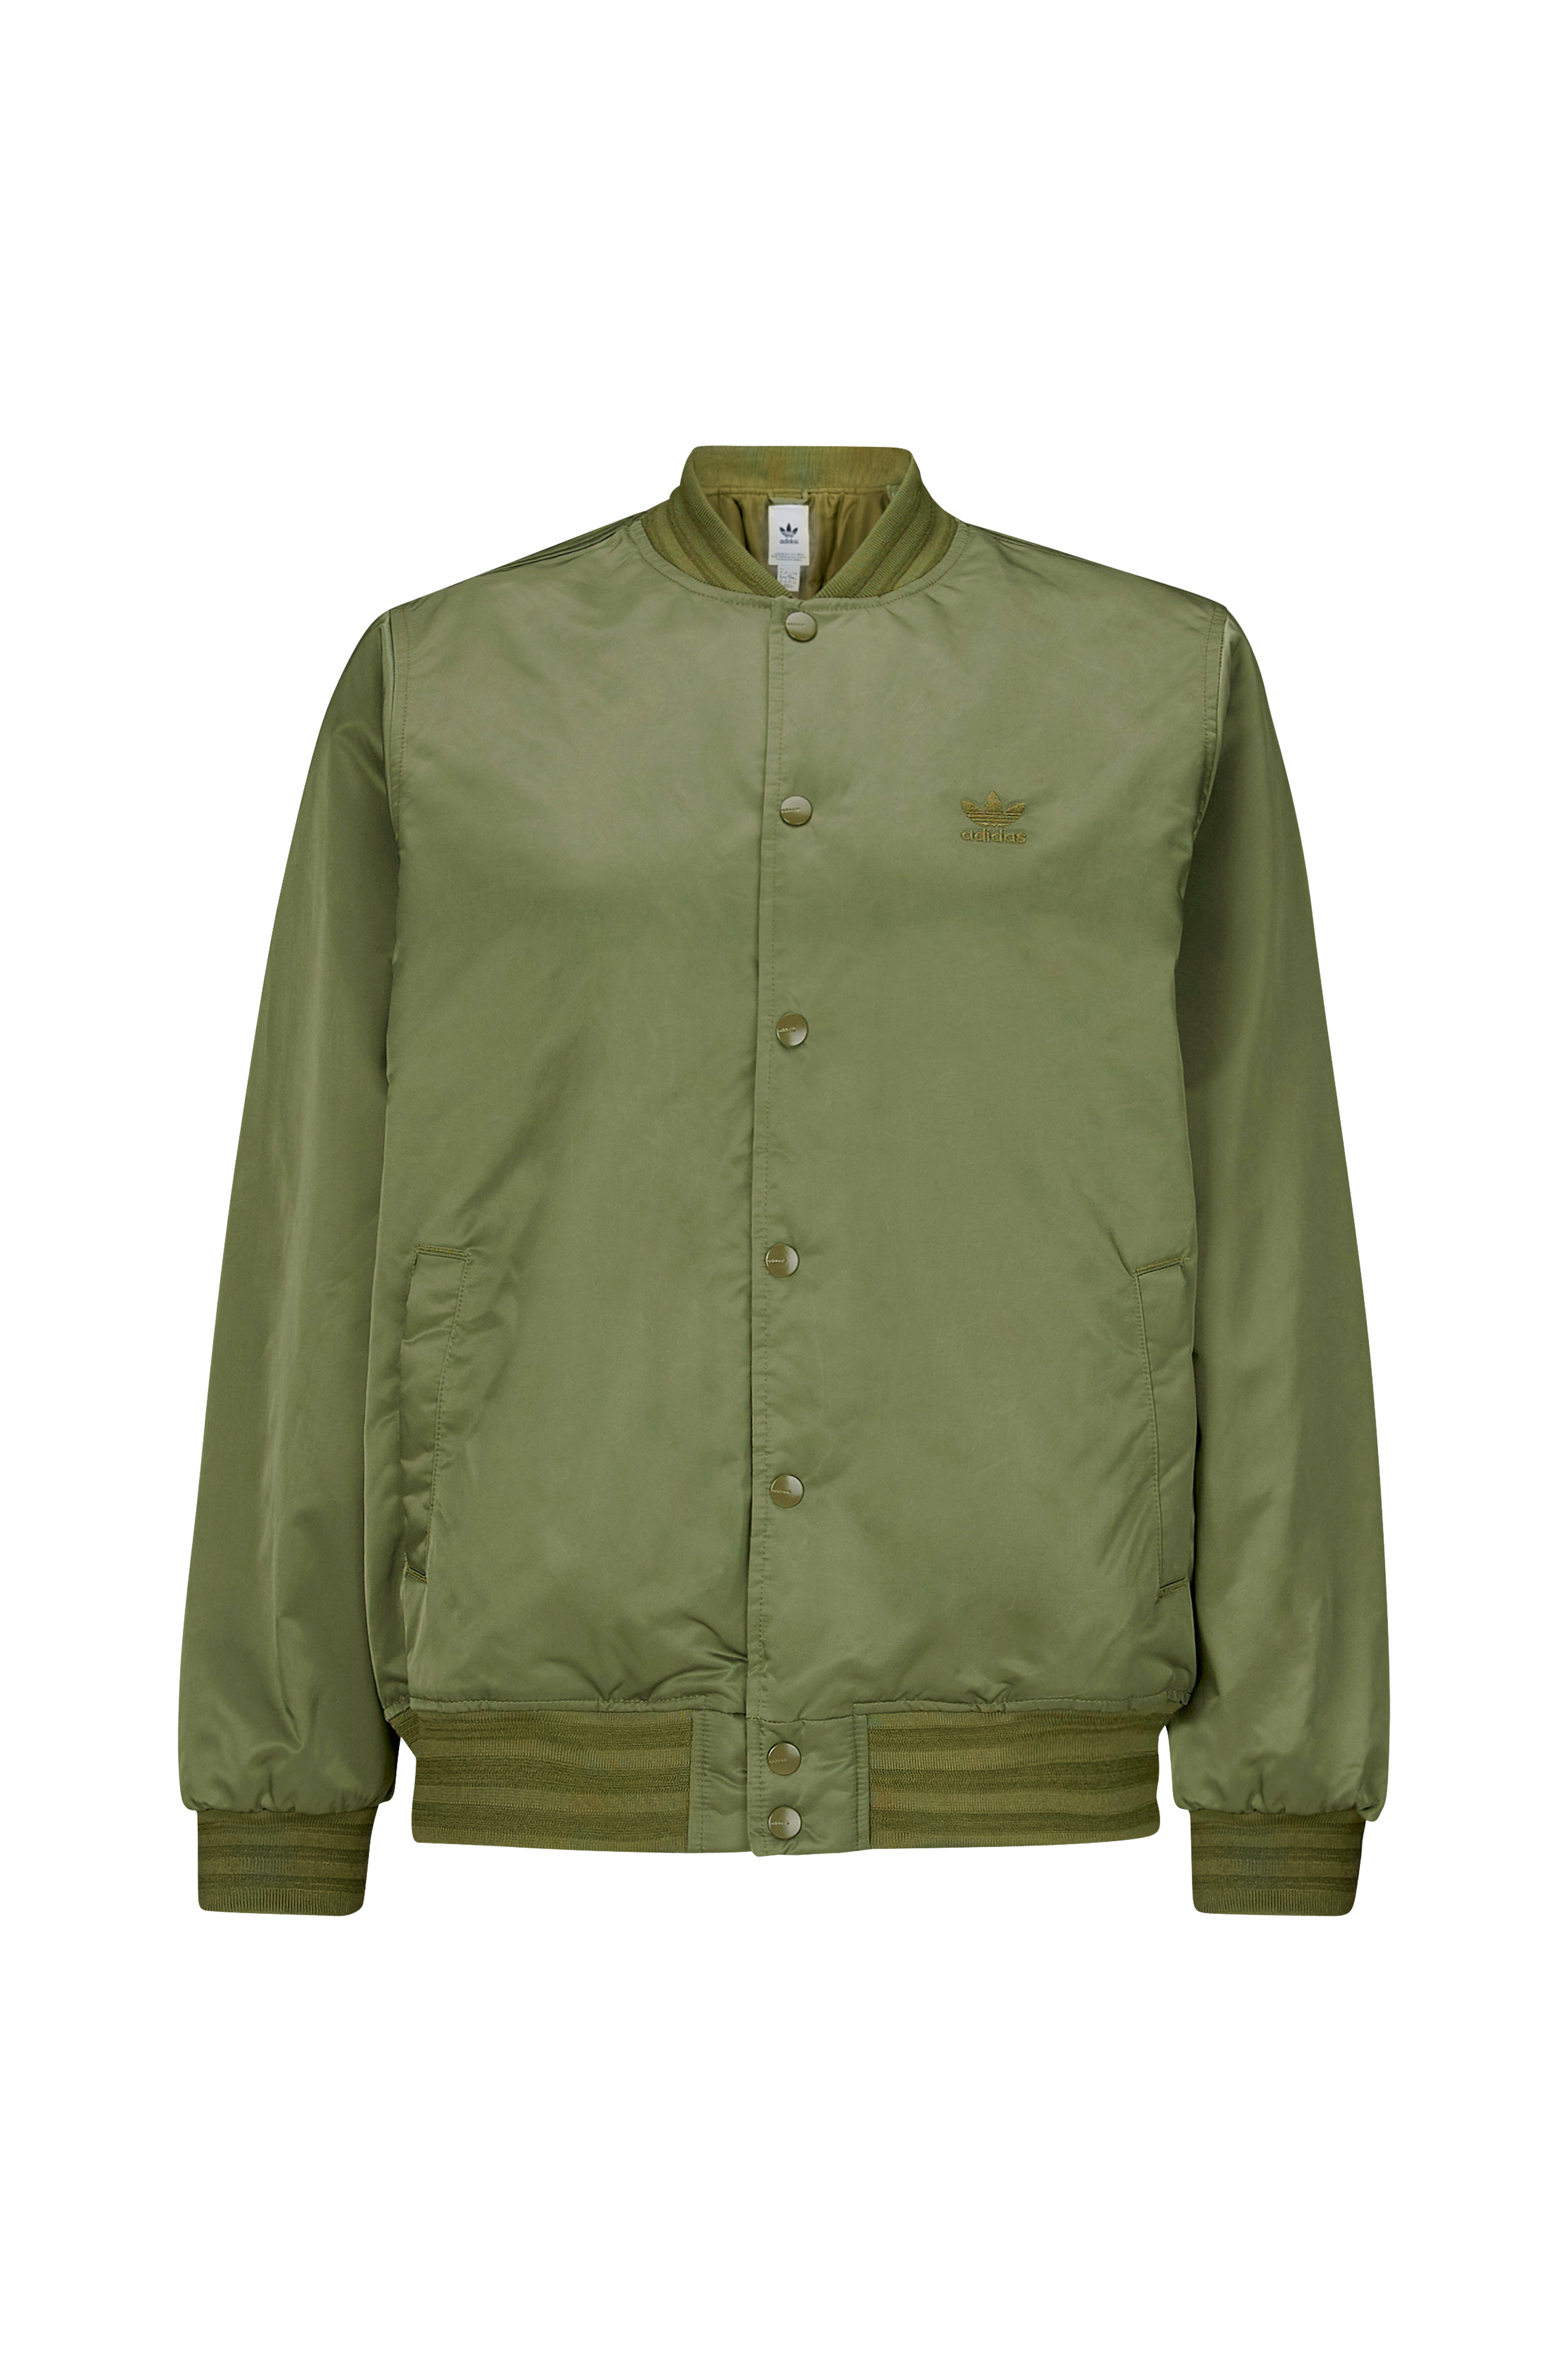 adidas Originals Bomberjakke Styling Complements SST Jacket